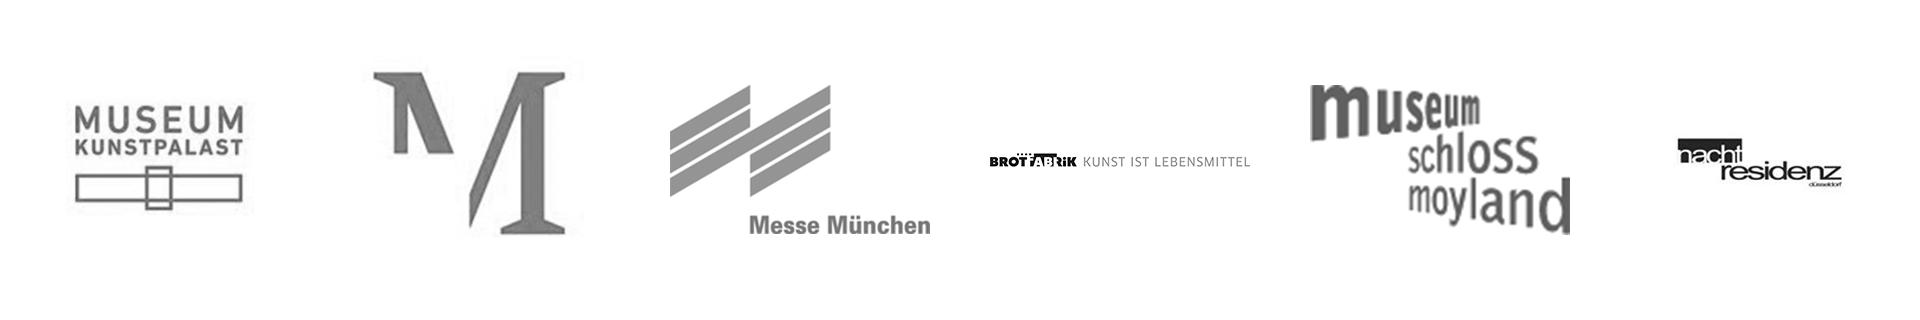 Museum Kunstpalast, Marta Herford, Messe München, Brotfabrik, Schloss Moyland, nachtresidenz